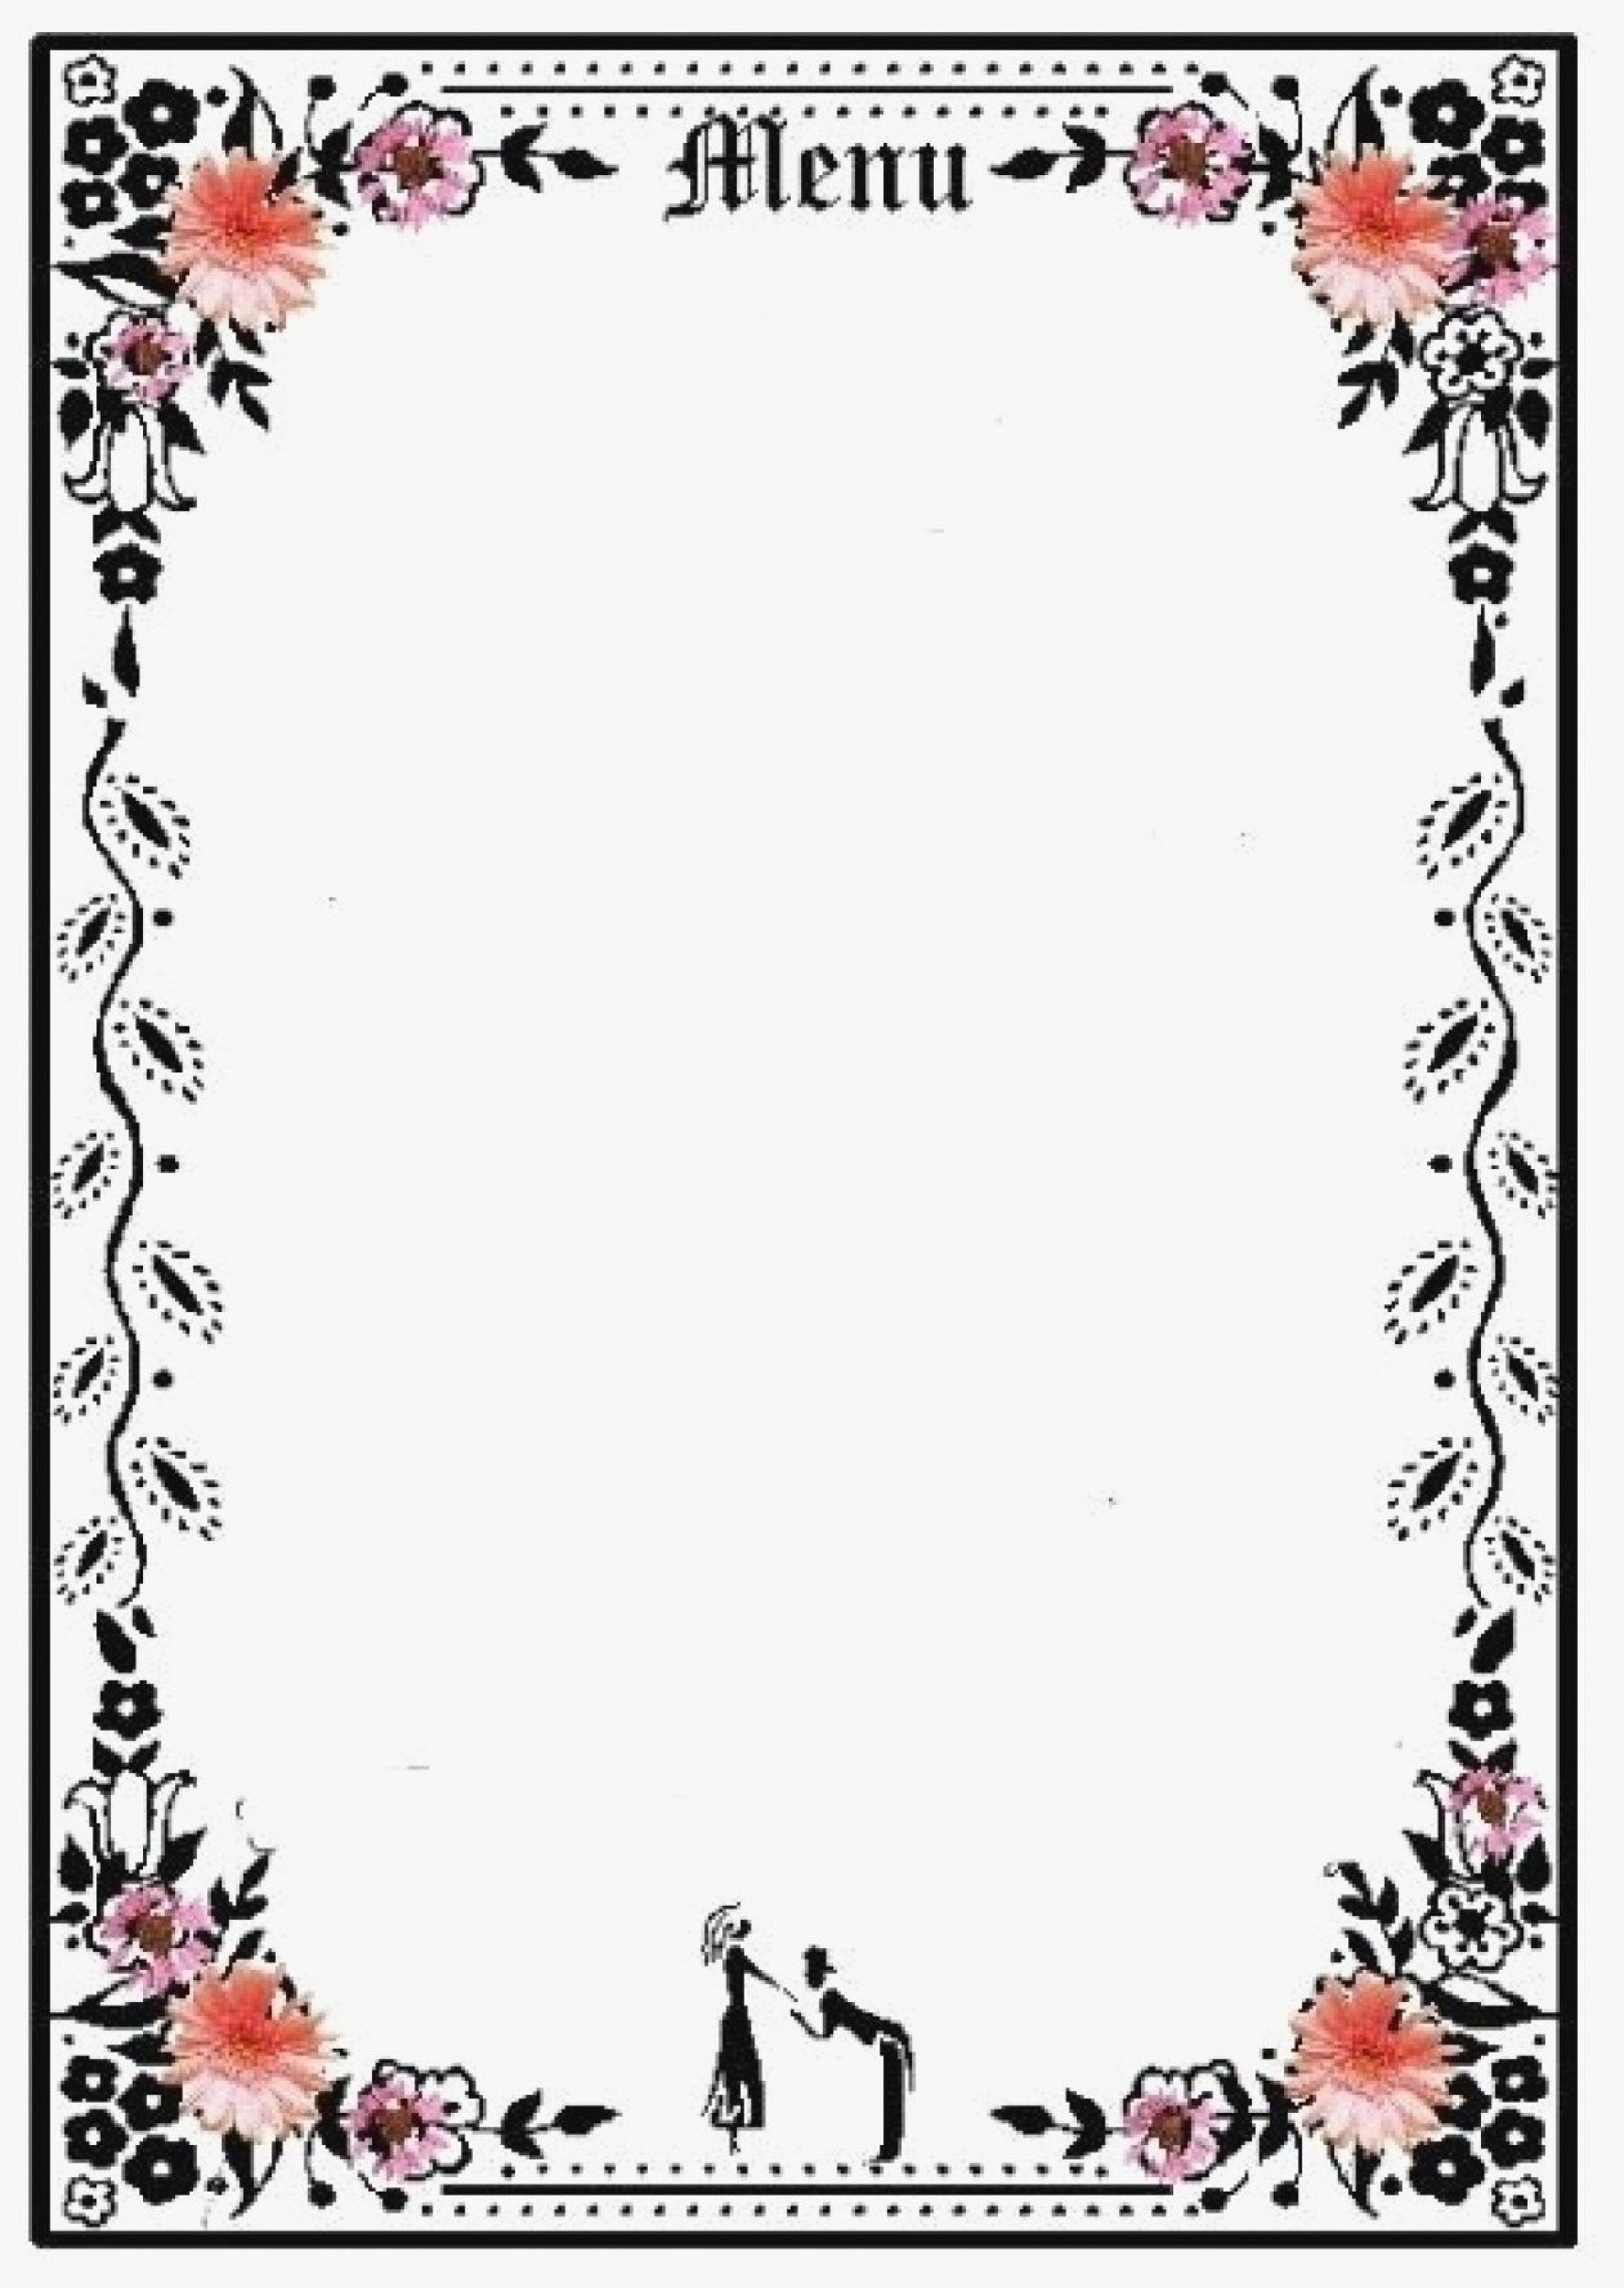 003 Wonderful Blank Restaurant Menu Template Example  Free Printable Downloadable1920